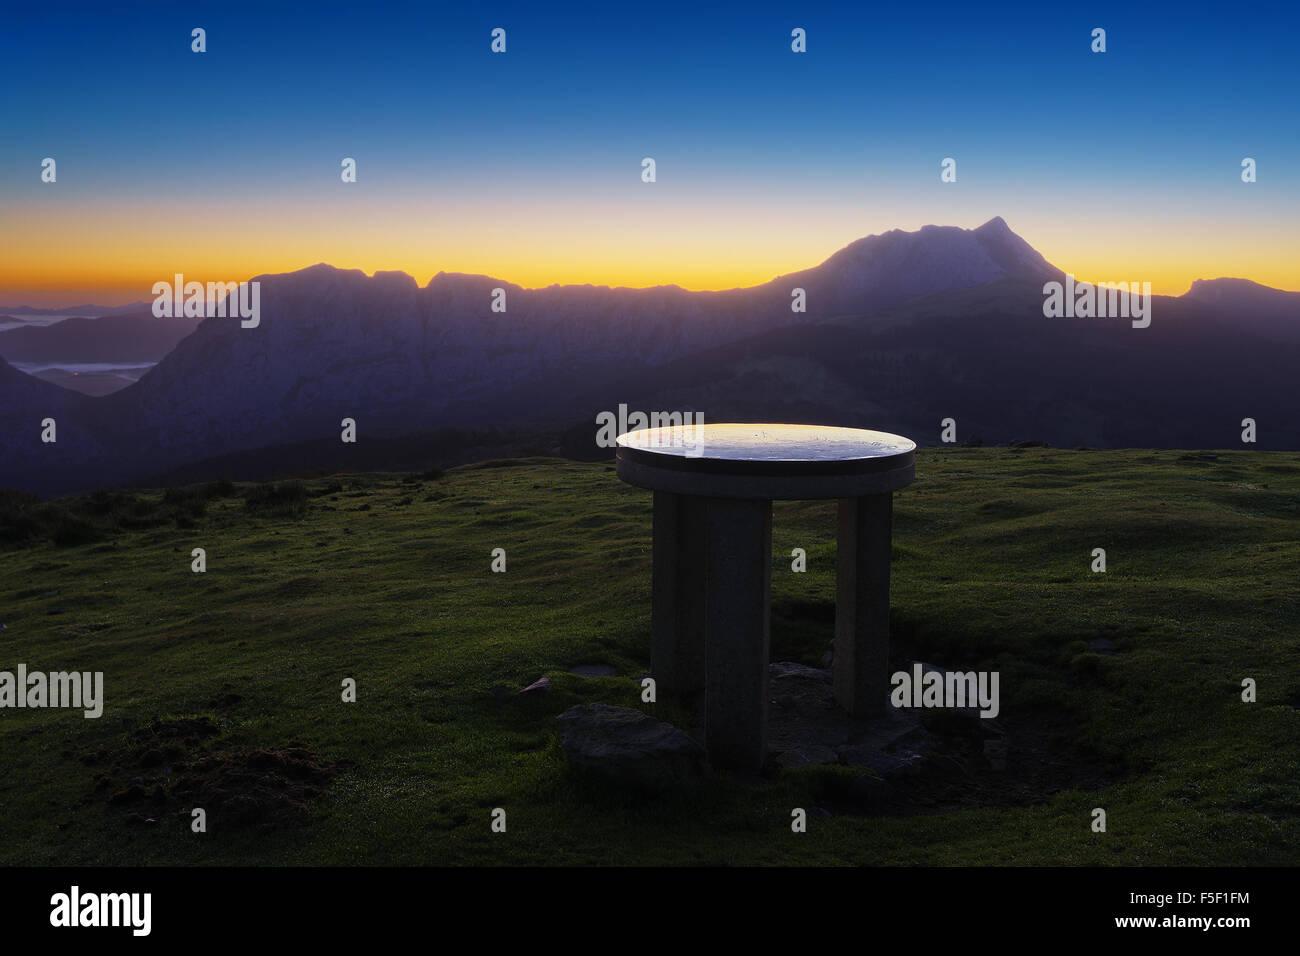 Urkiola mountain range from Saibi with orientation table - Stock Image